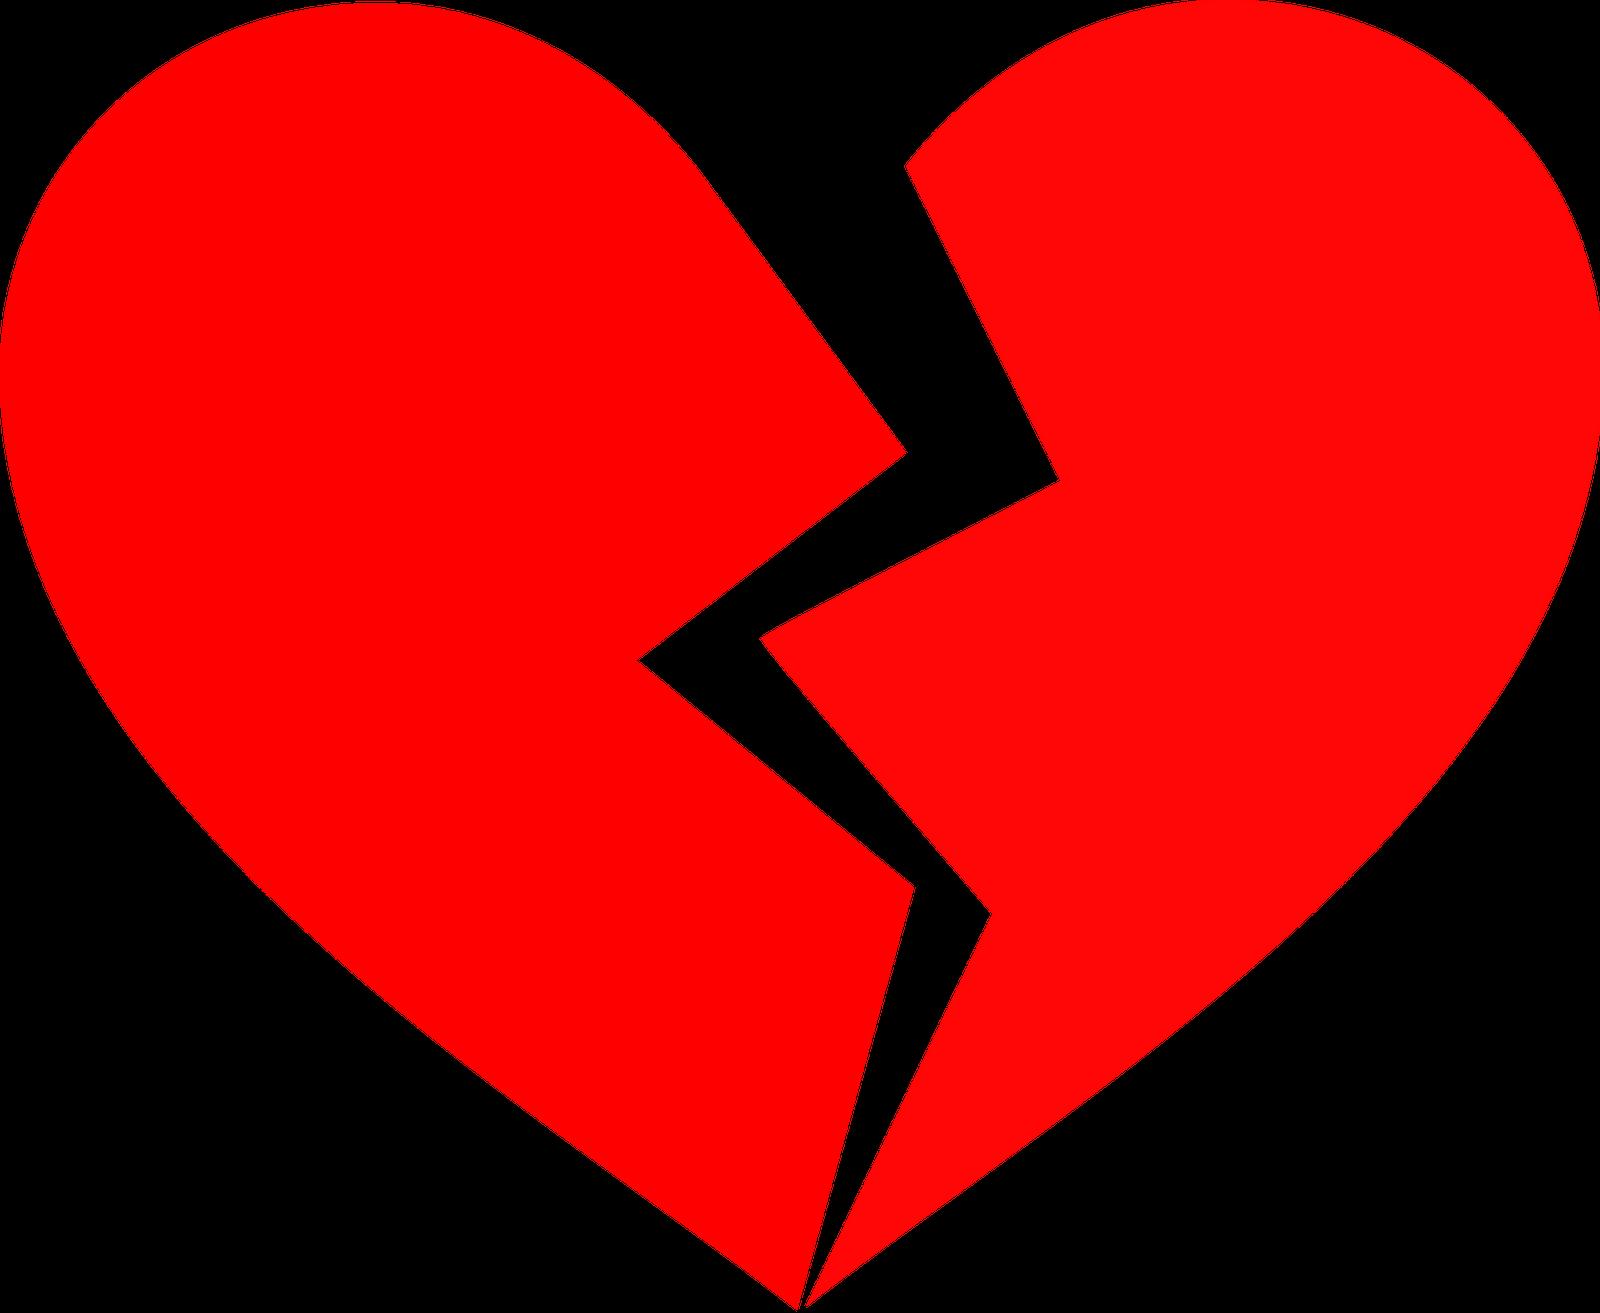 Half Heart Clipart.